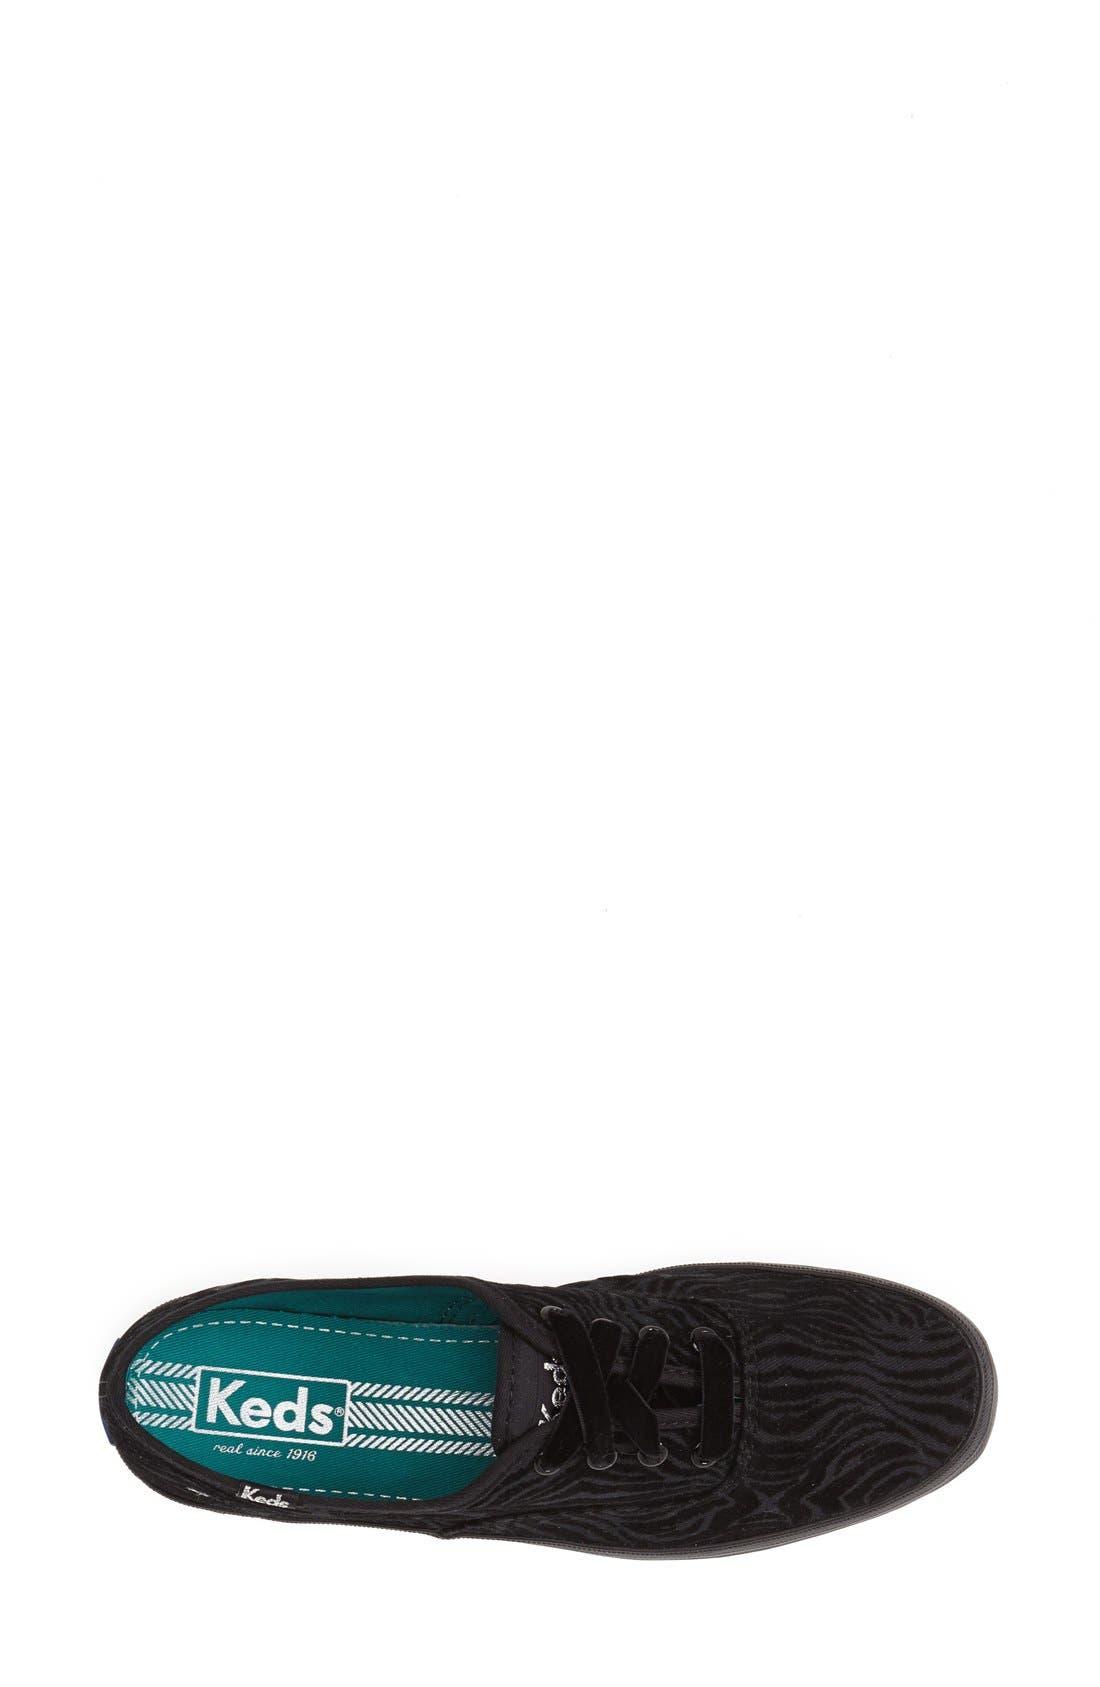 Alternate Image 3  - Keds® 'Champion - Zebra Stripe' Sneaker (Women)